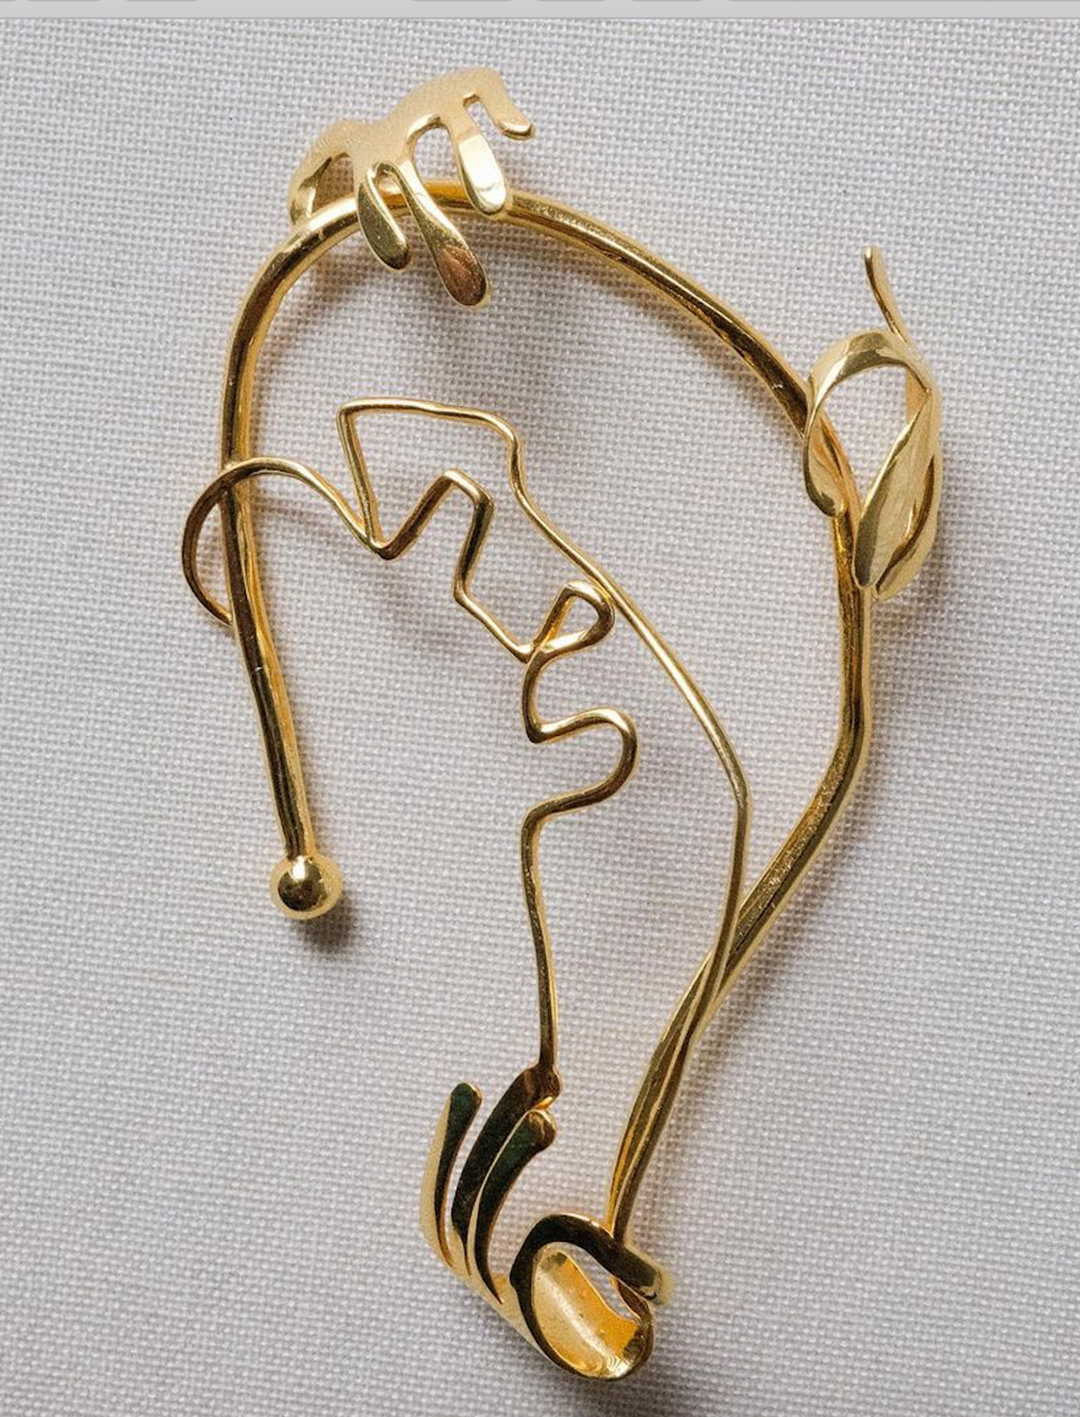 a piece of gold ear jewellery